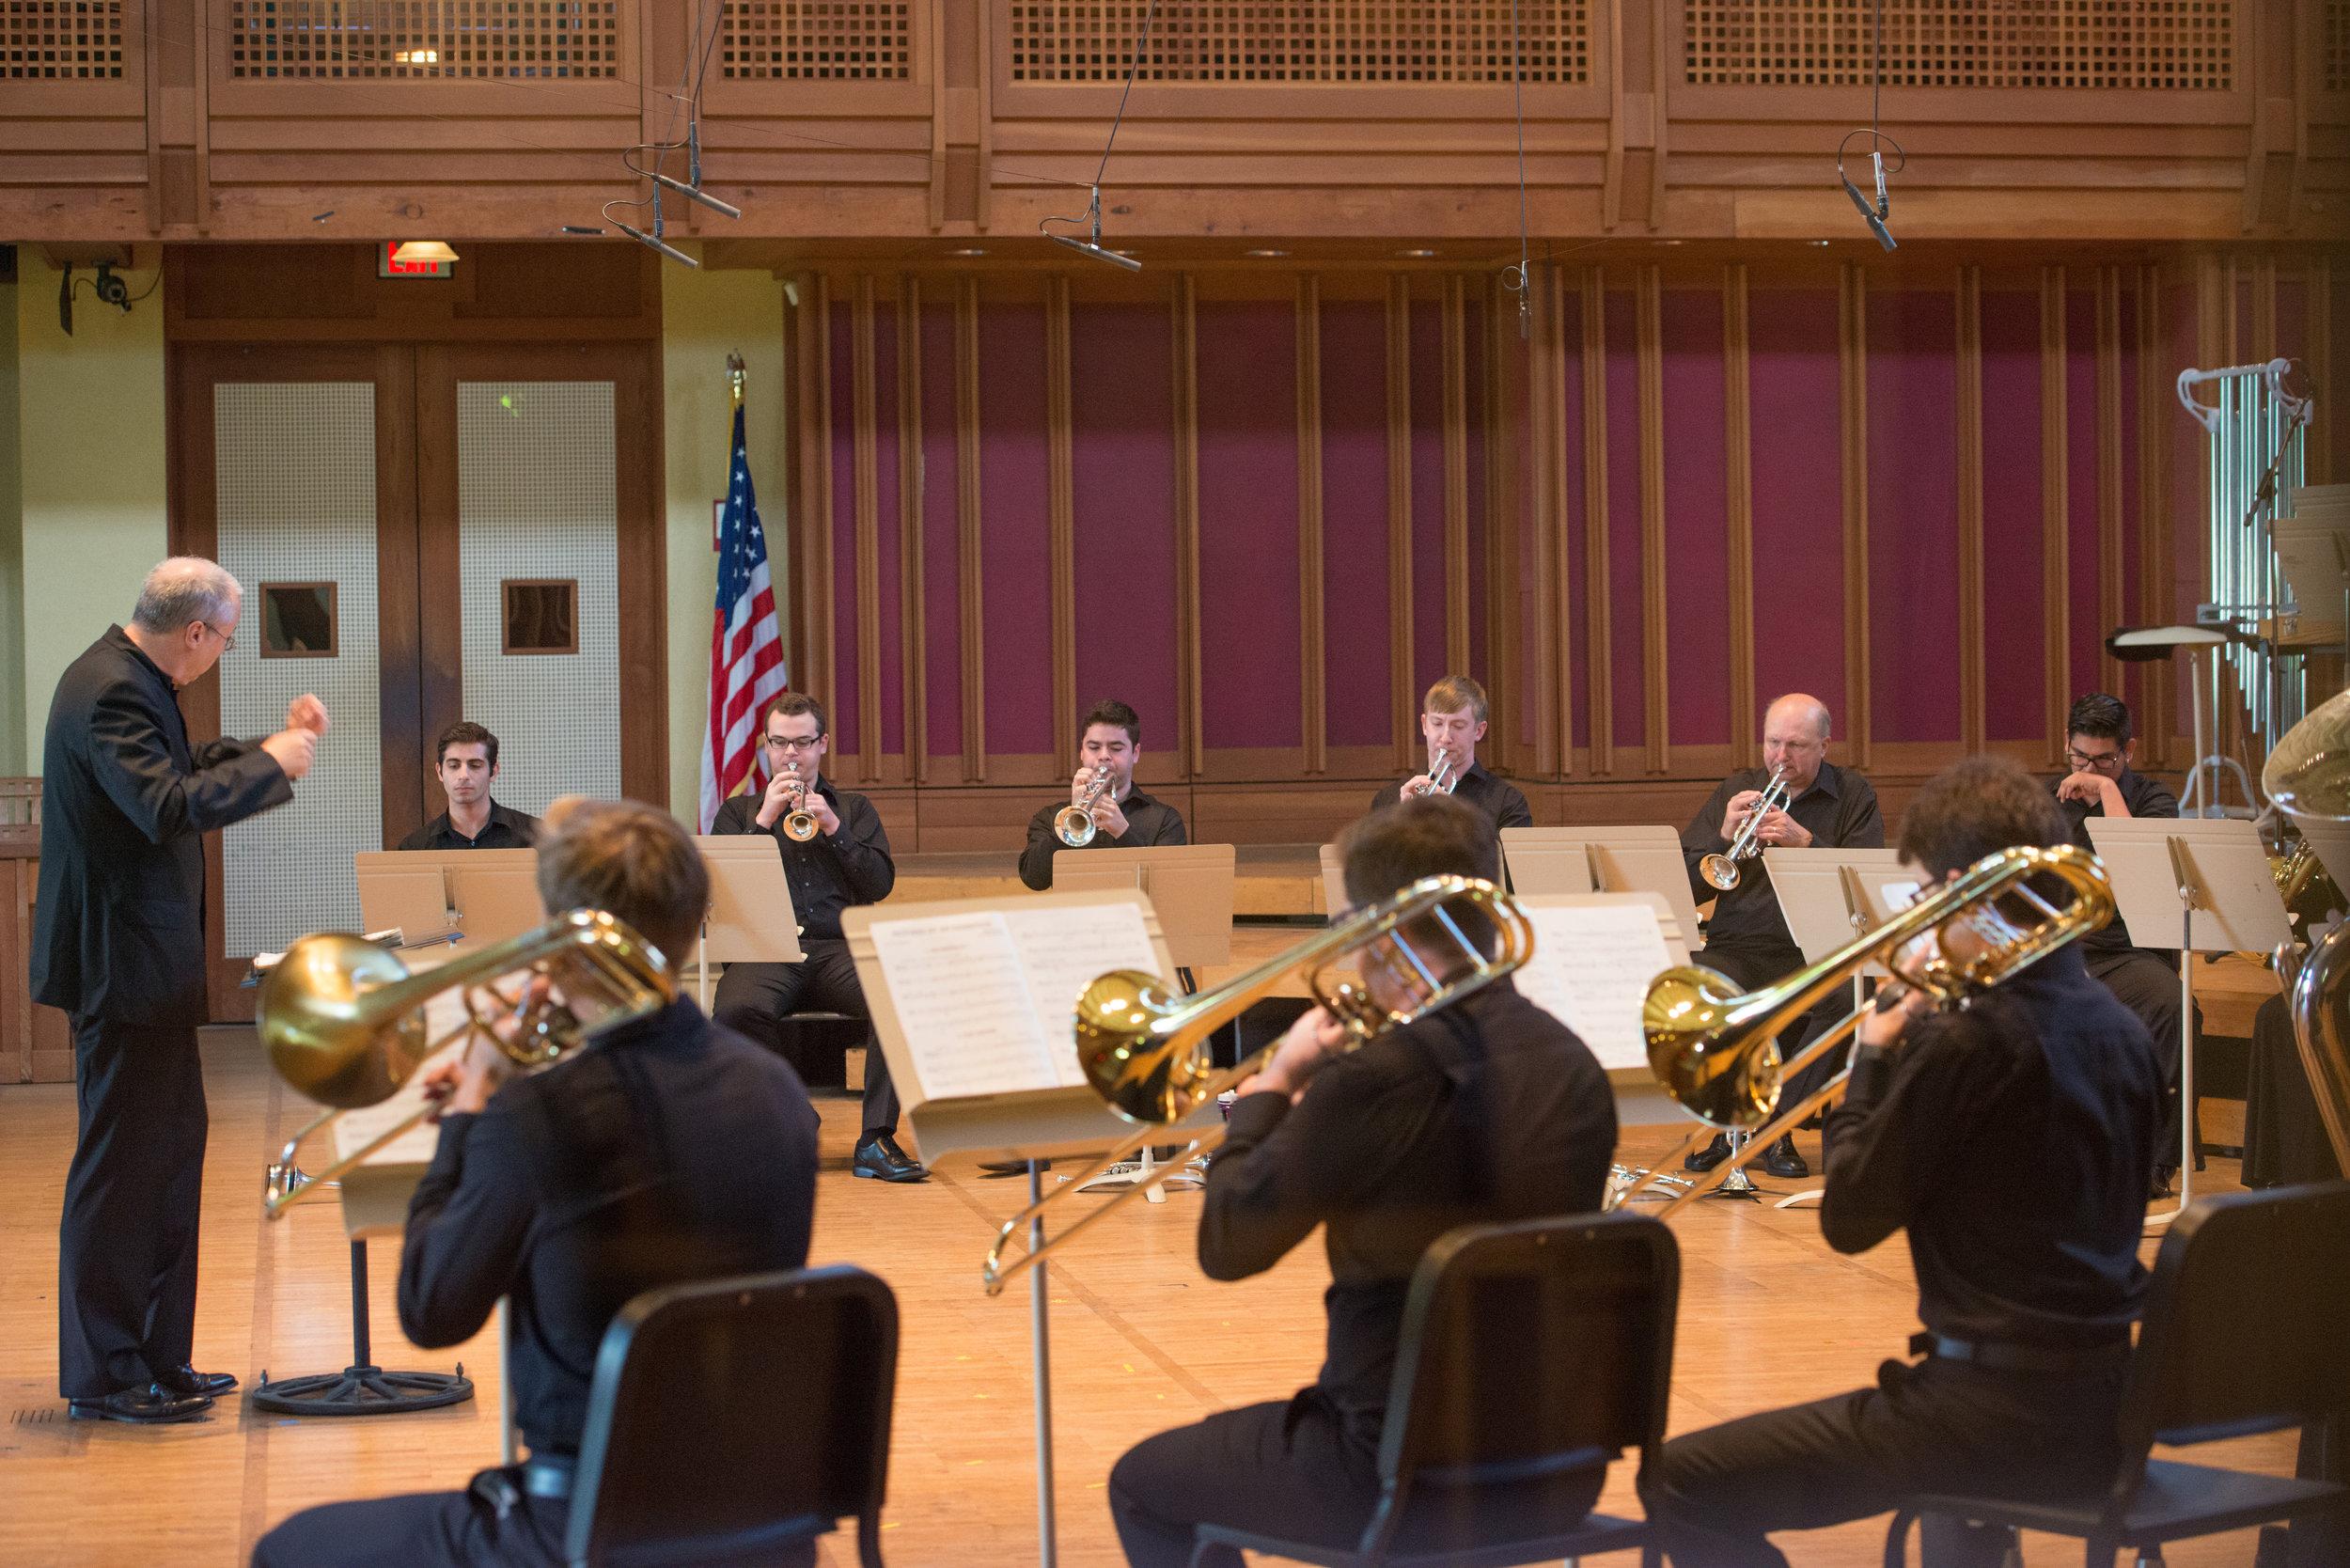 TMC Brass Concert - 10am on July 2 at Ozawa Hall, Lenox MA